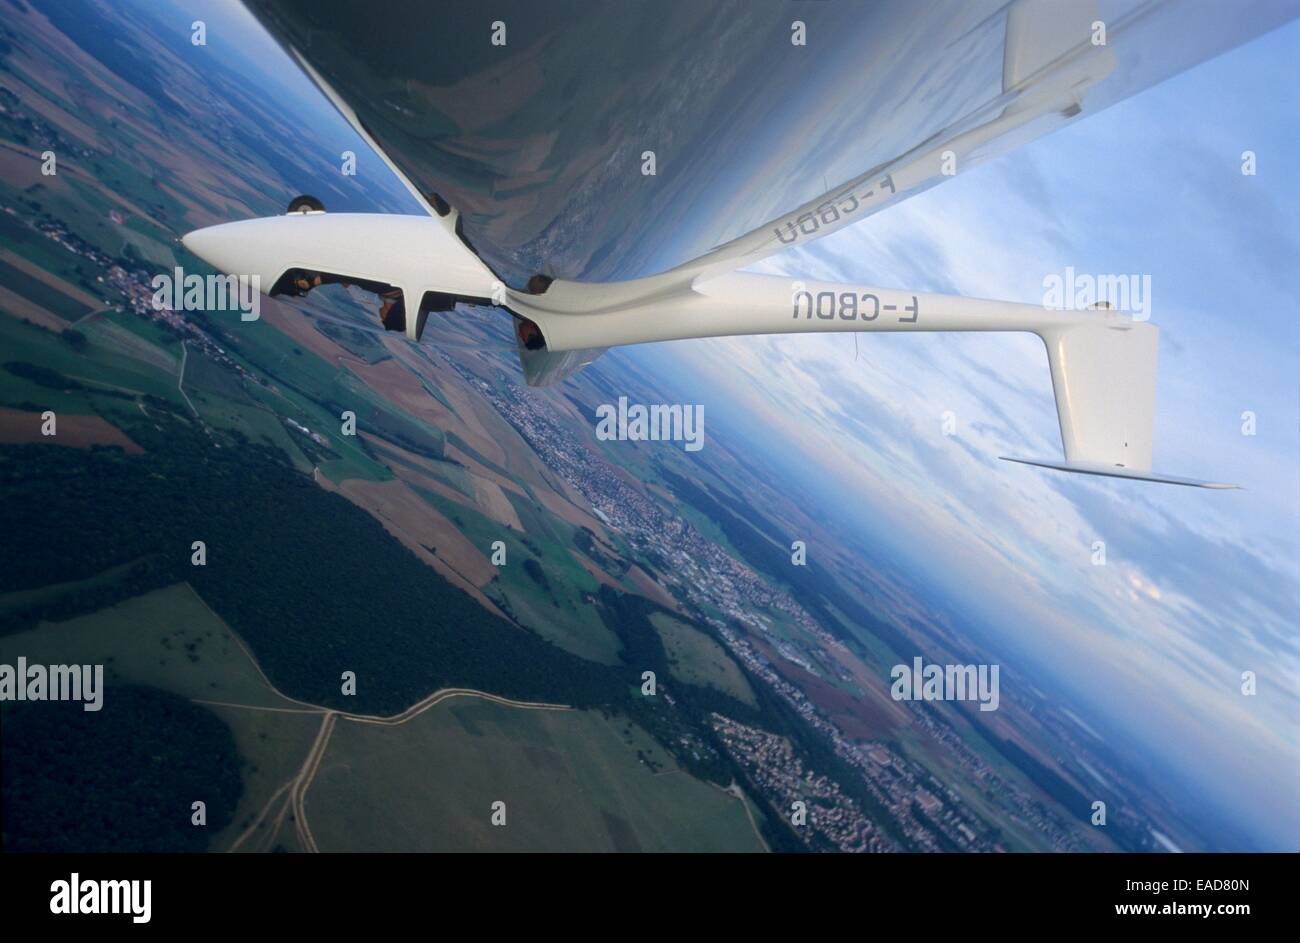 Glider plane in aerobatic flight over Nancy, Lorraine region, France - Stock Image